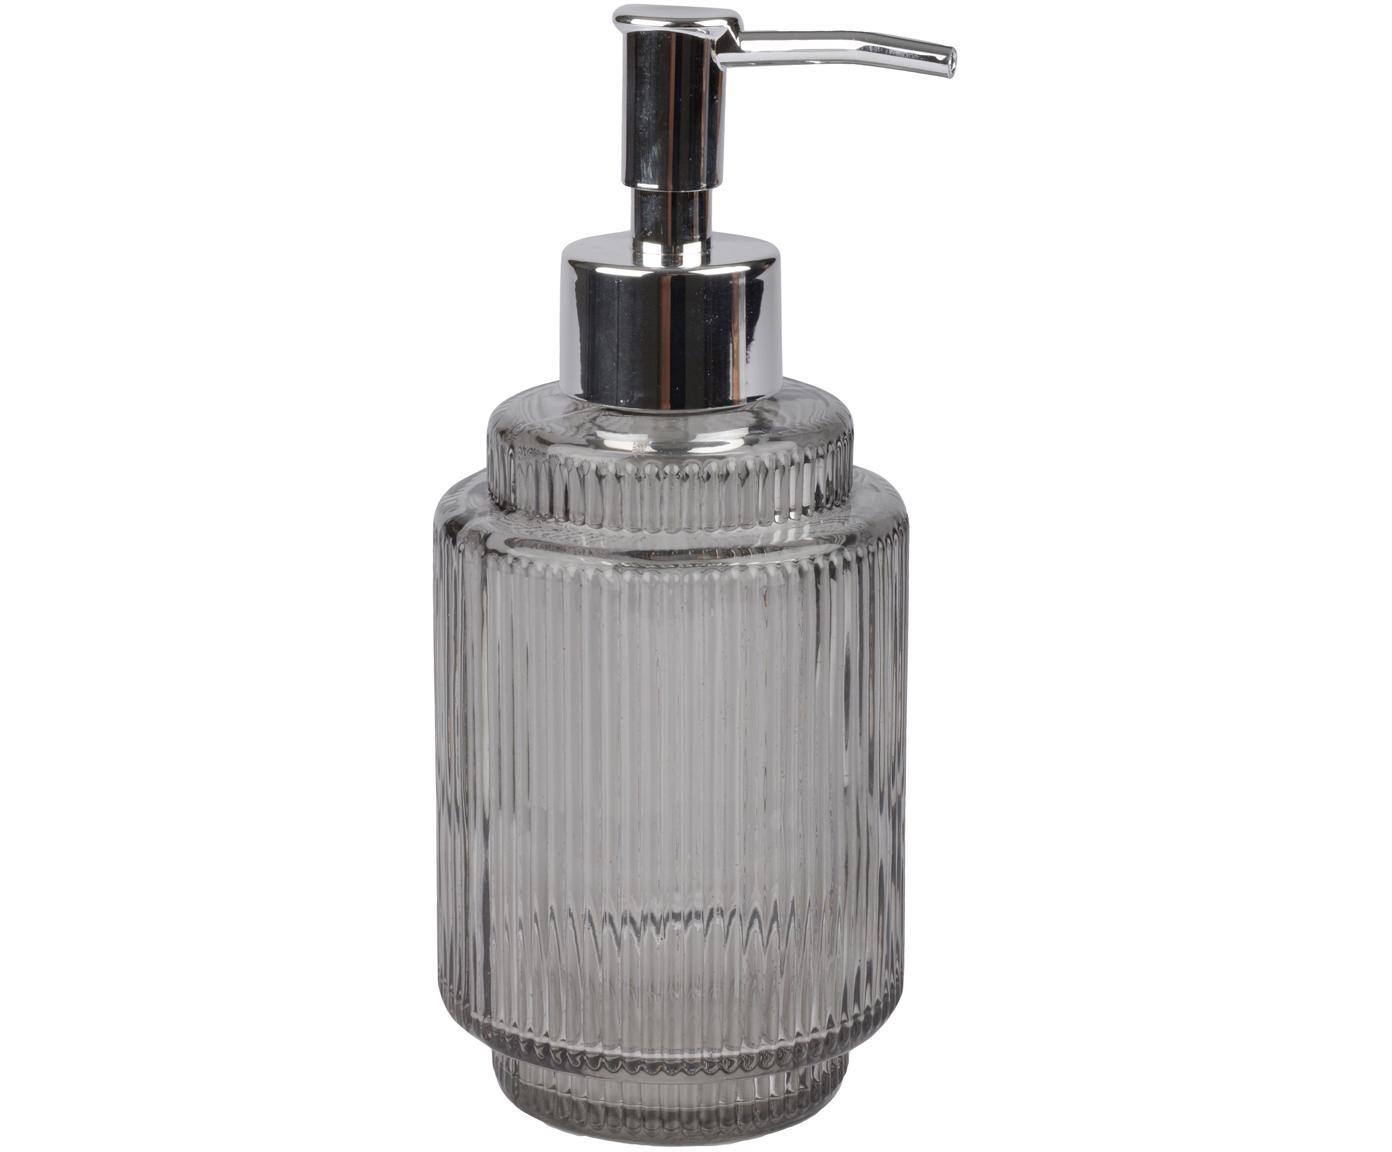 Dispenser sapone in vetro scanalato Ligia, Vetro, Grigio, trasparente, argentato, Ø 8 x Alt. 17 cm